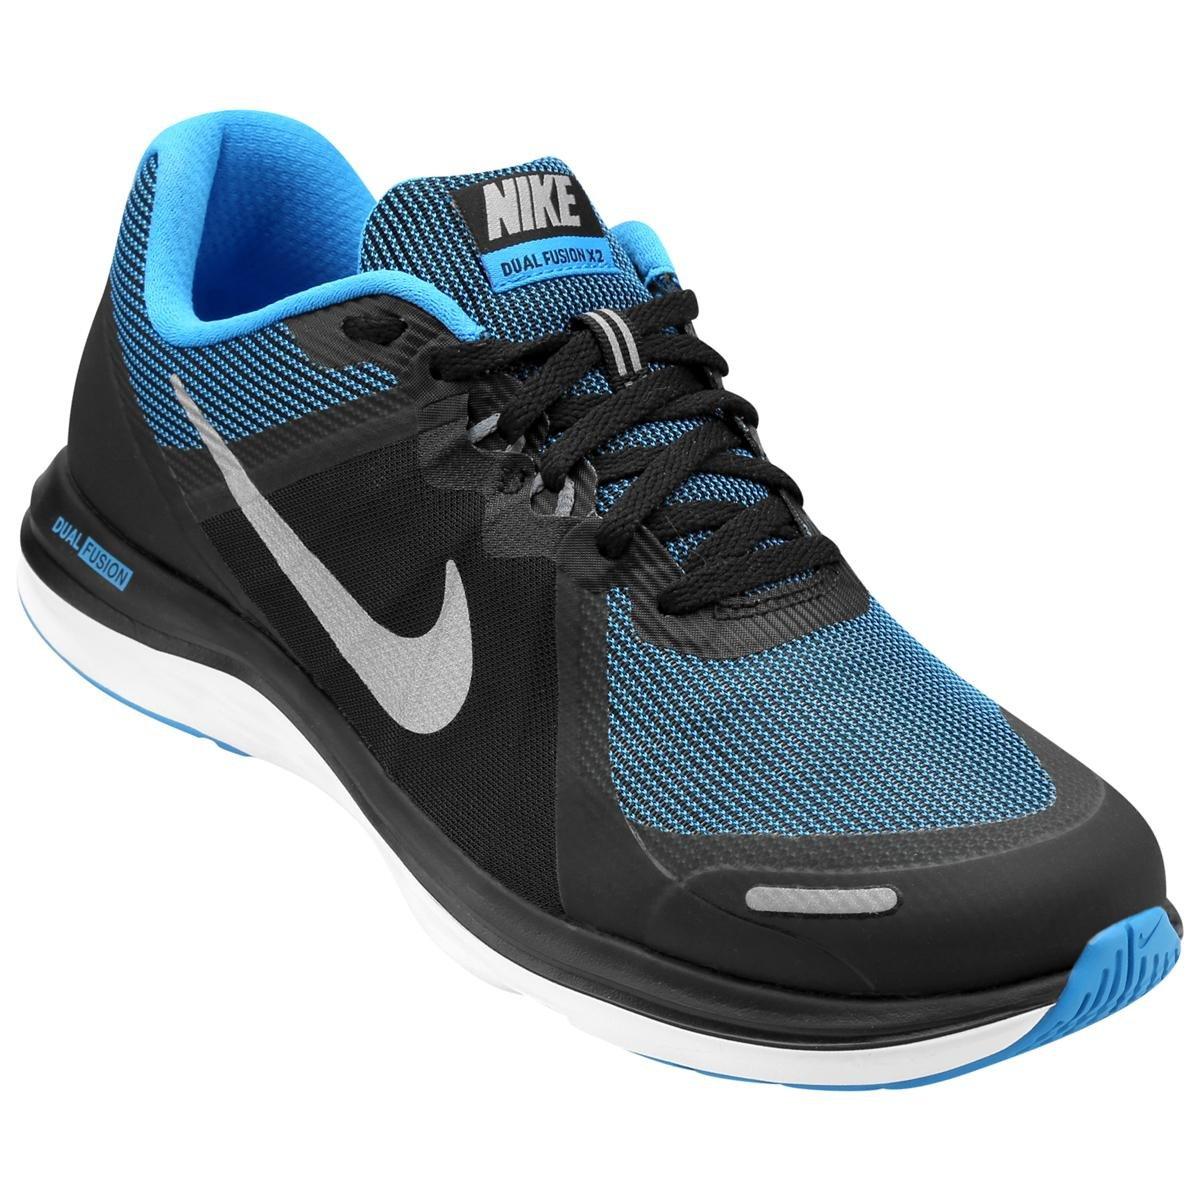 1a7e83ee0 Tênis Nike Dual Fusion X 2 Masculino | Netshoes